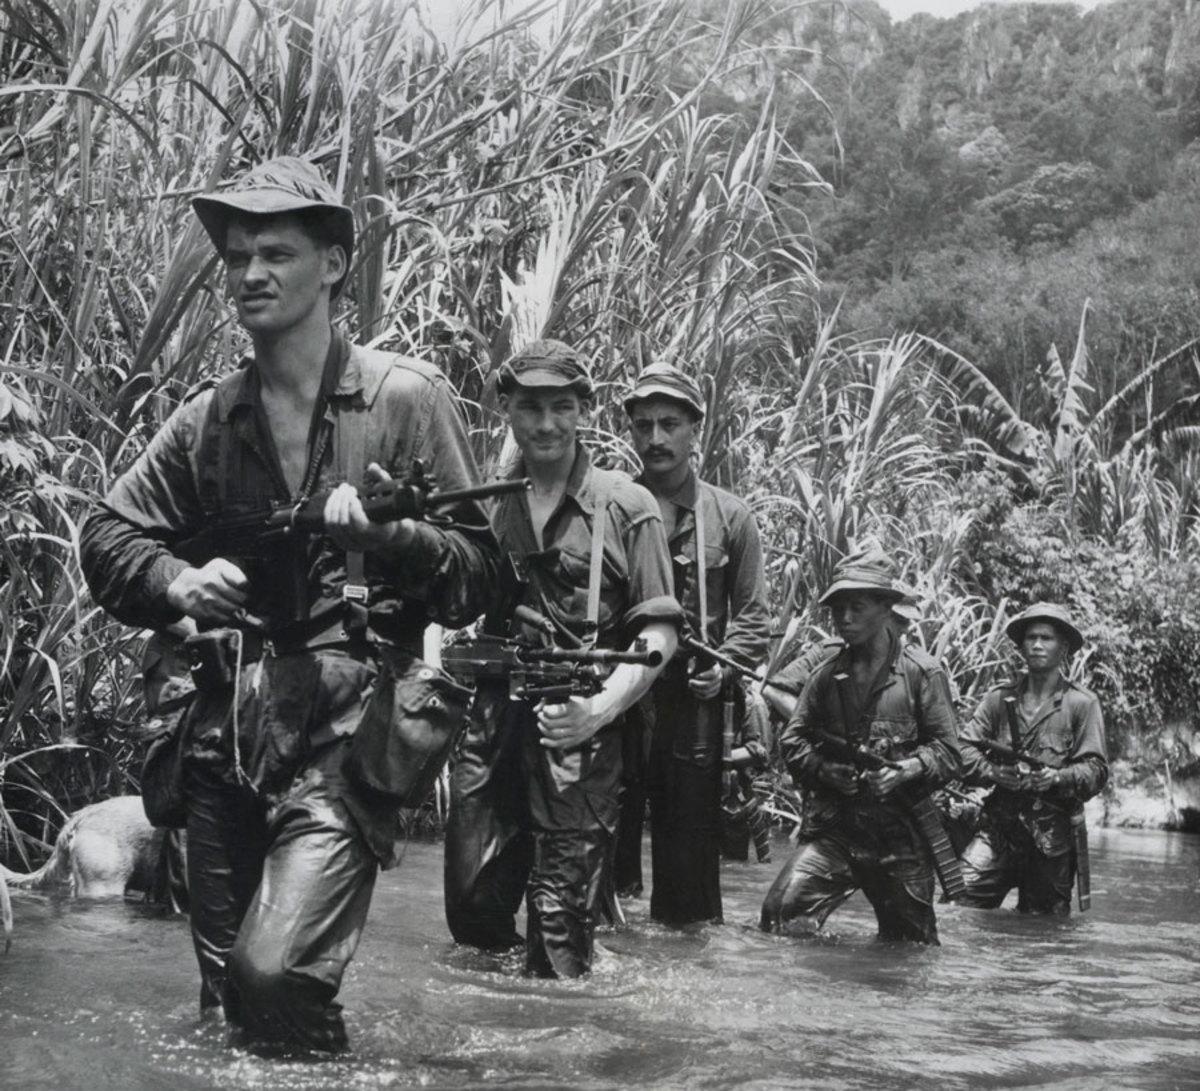 SAS trackers in the Malayan jungle in 1950